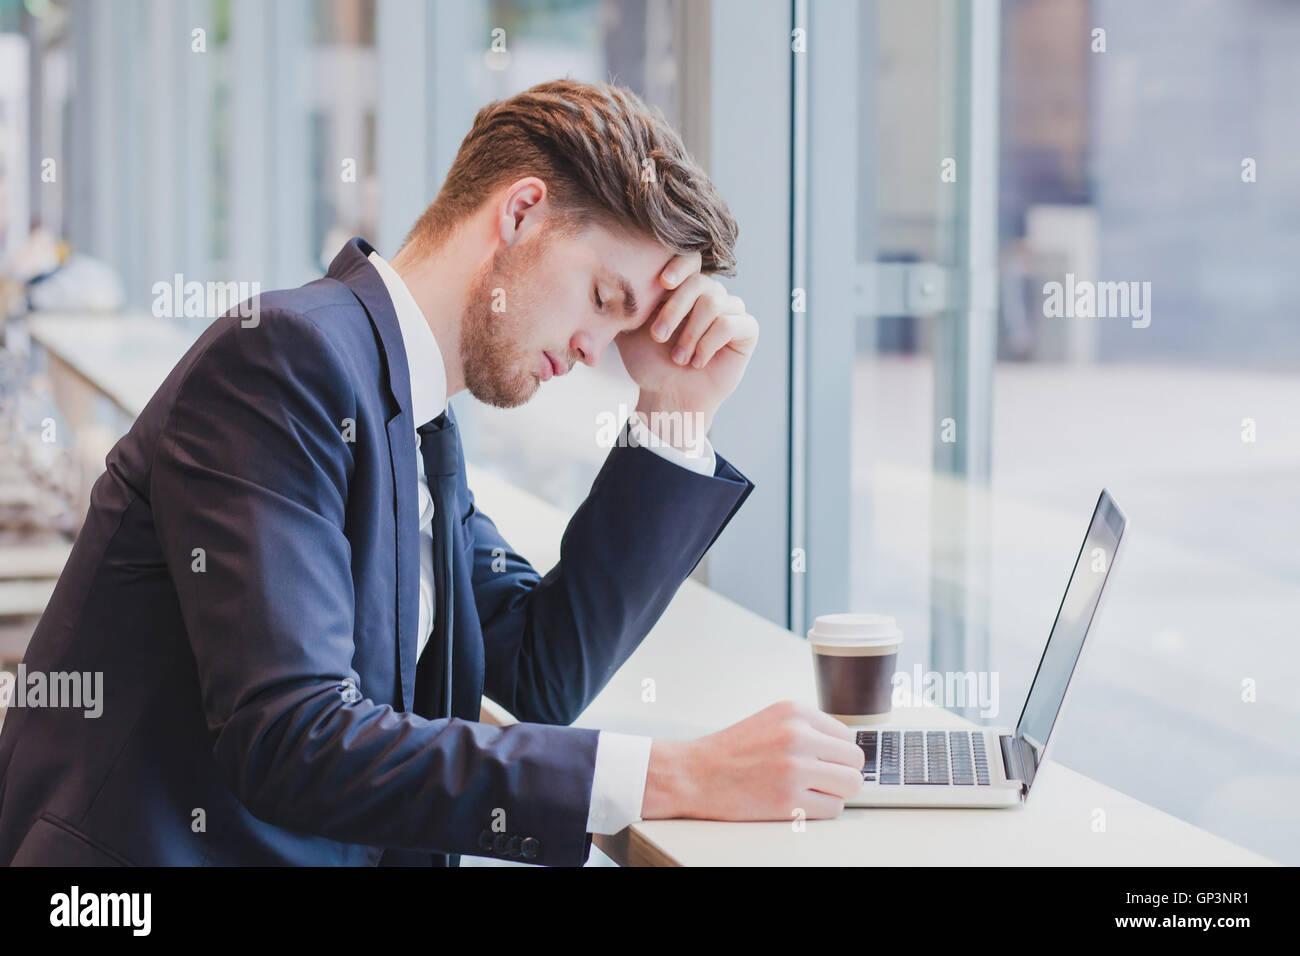 headache, tired business man near laptop - Stock Image